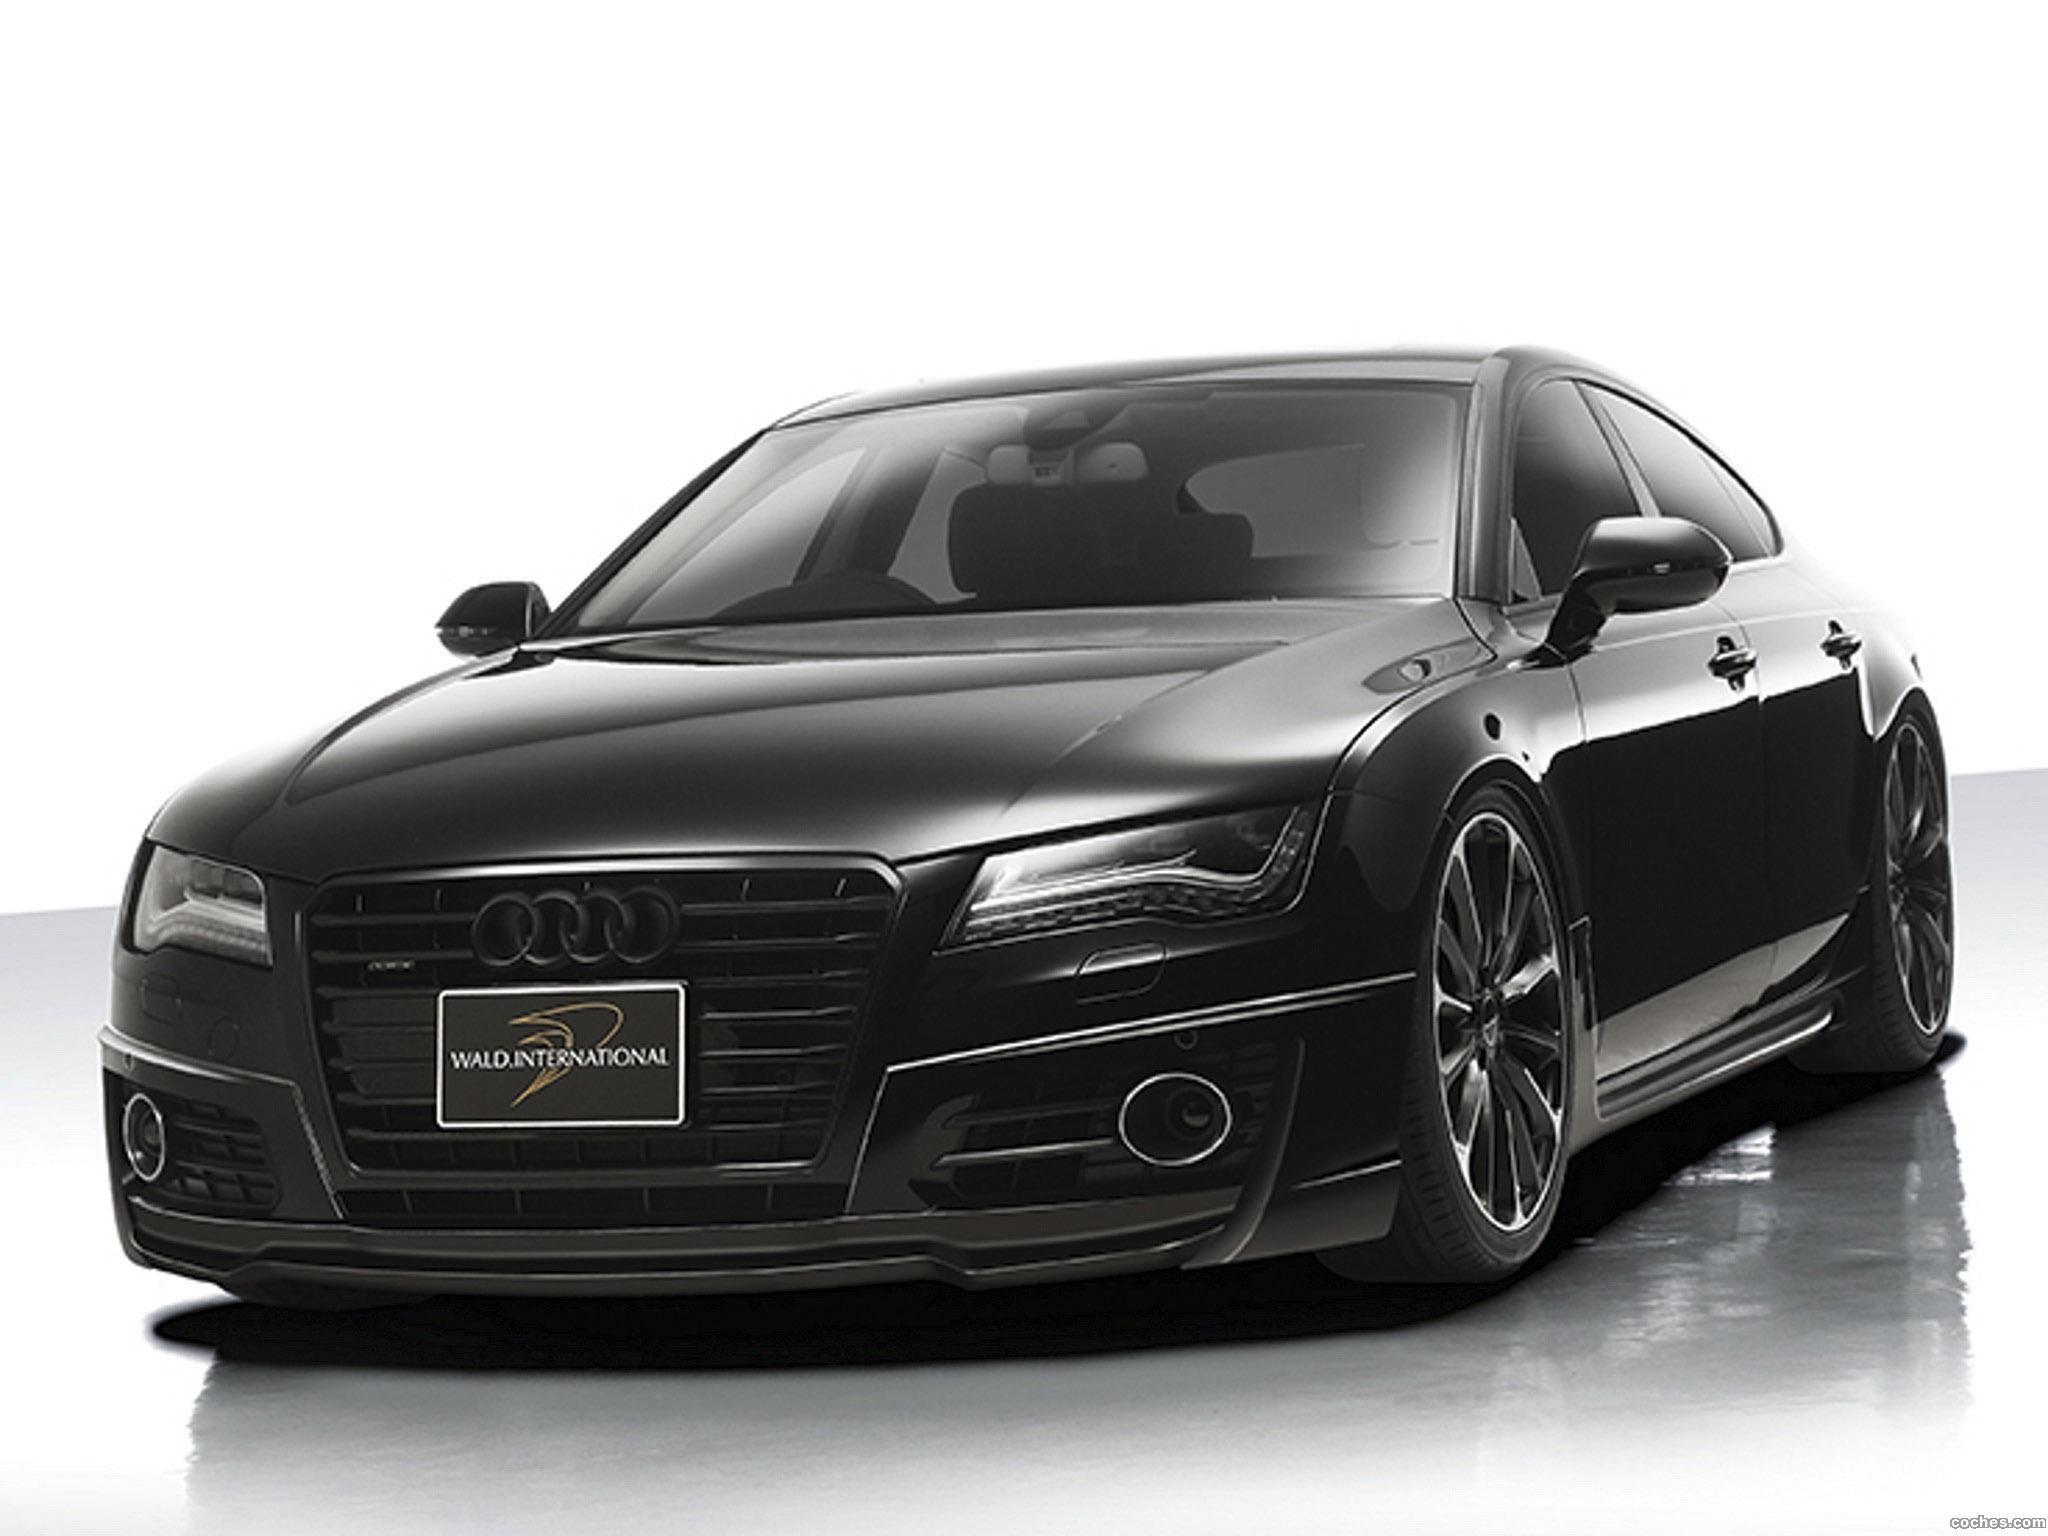 Foto 0 de WALD Audi A7 Sportback 2013